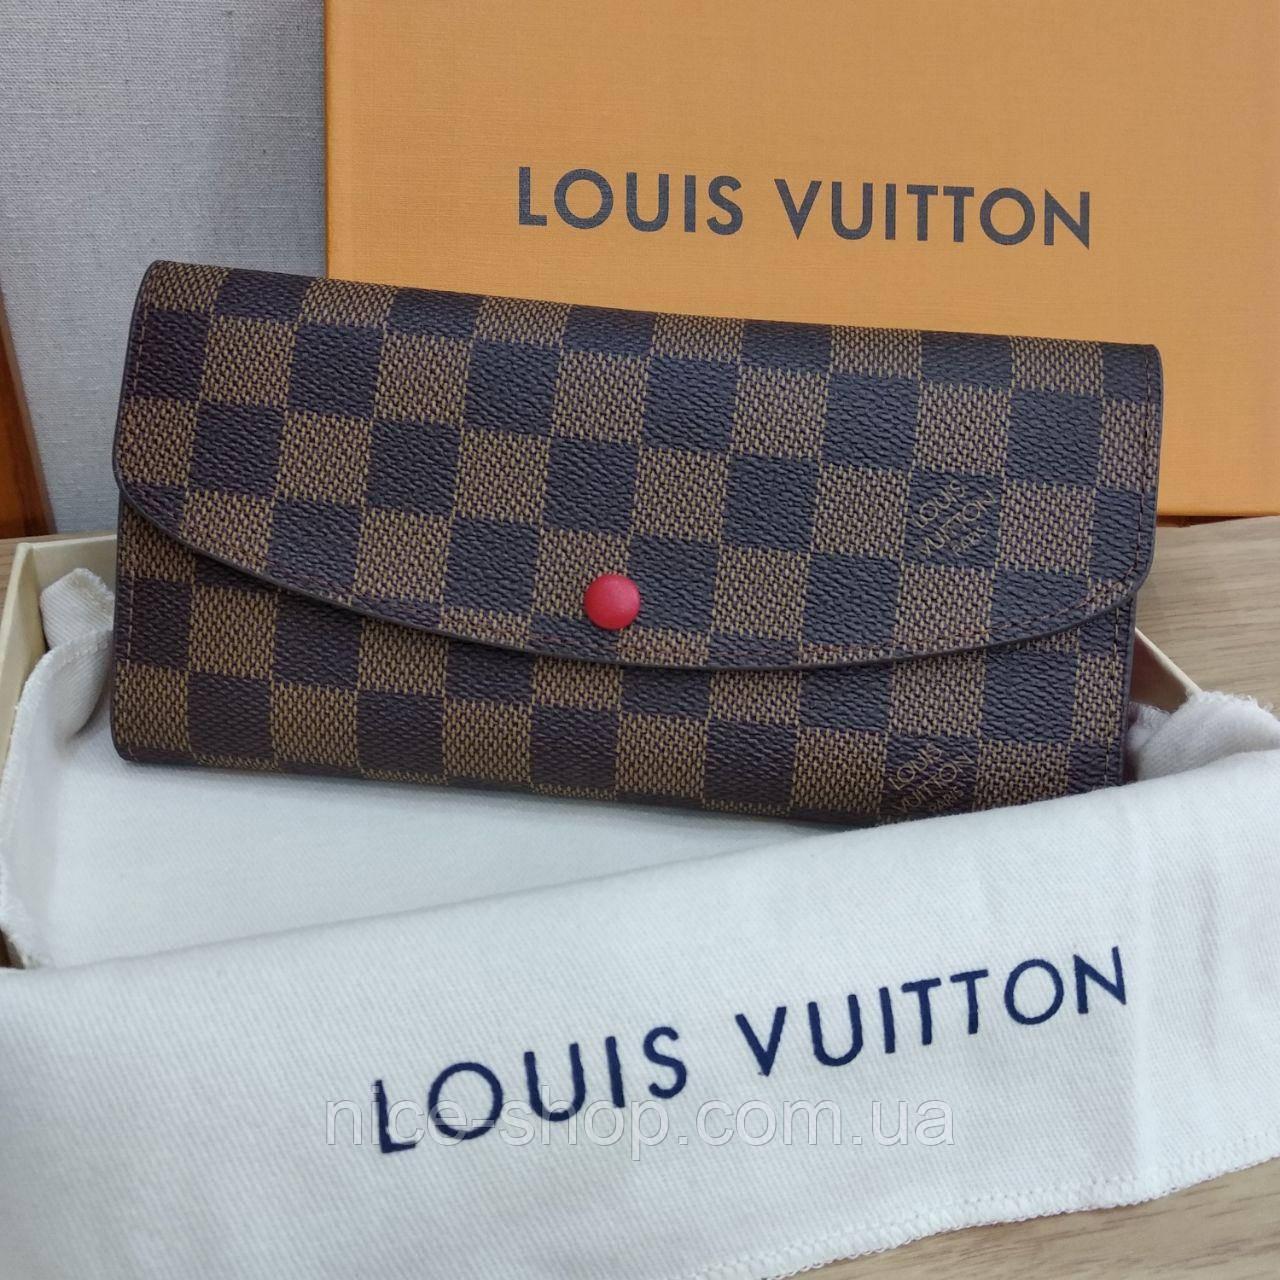 Кошелек Louis Vuitton кожаный на кнопке